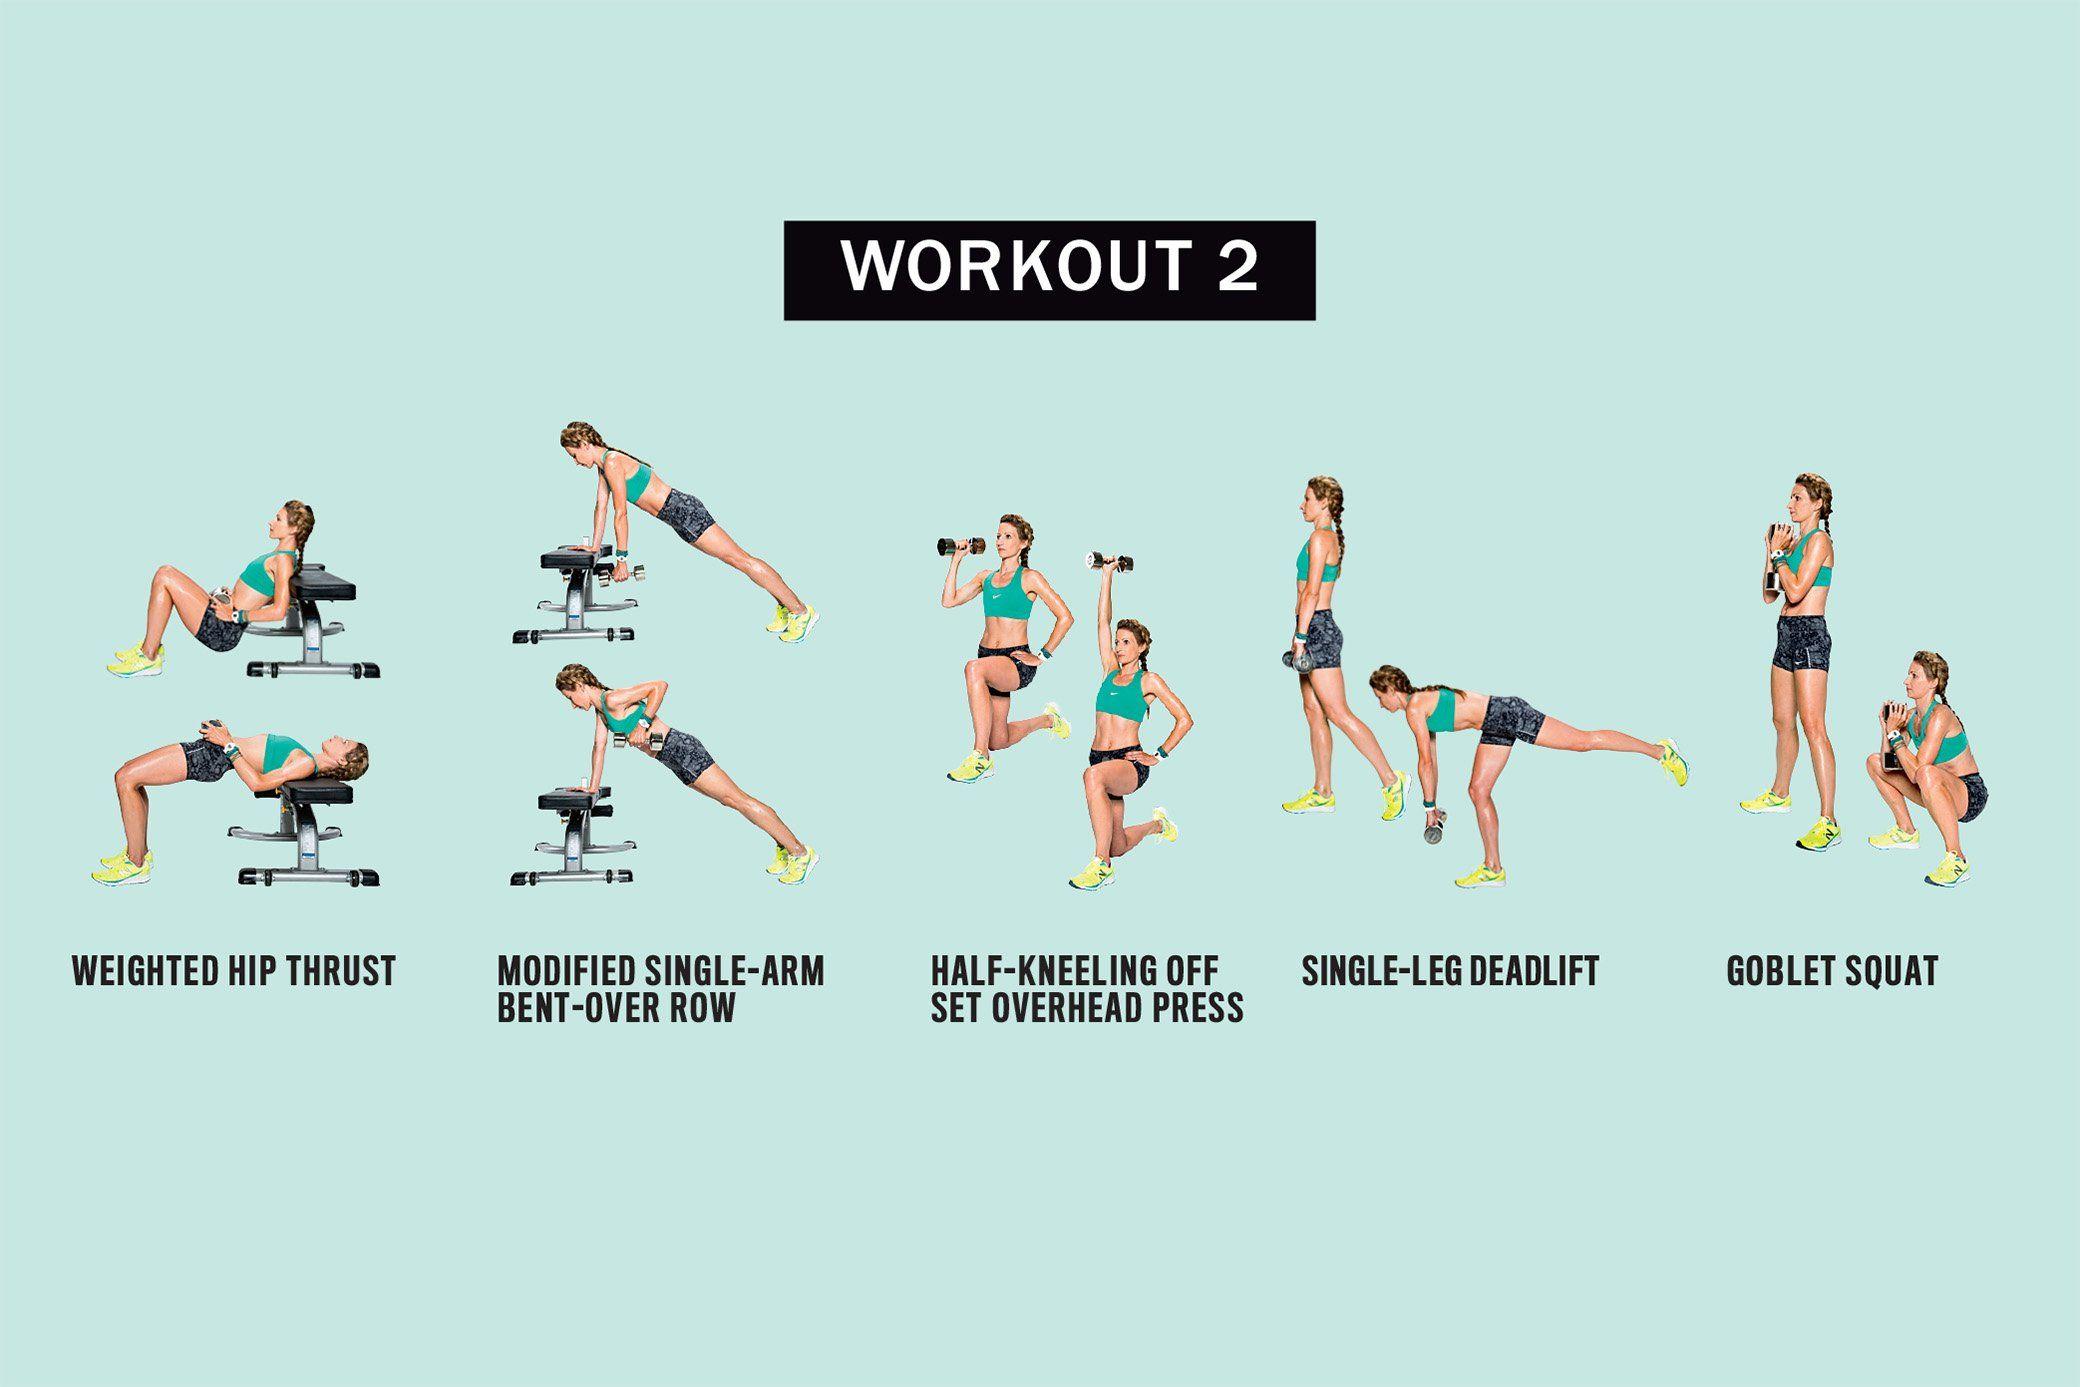 Workout 2 http://www.runnersworld.com/workouts/get-stronger-to-run-faster/slide/8